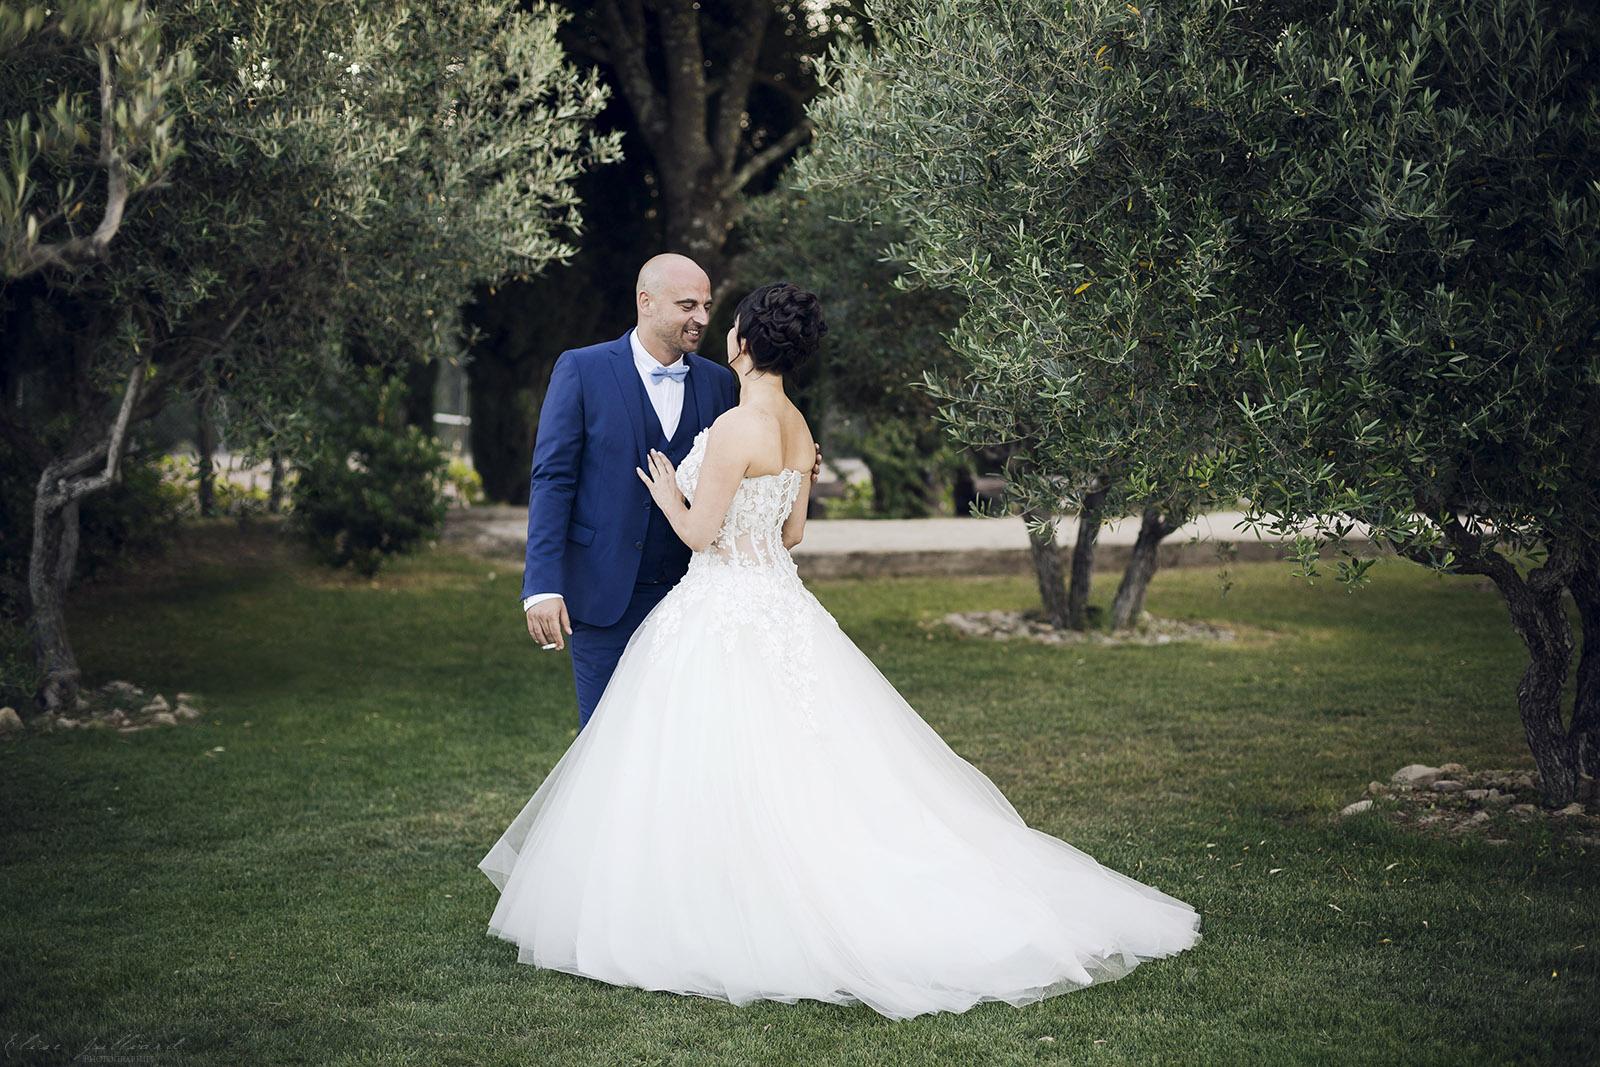 mariage-nimes-provence-alpes-cote-azue-languedoc-occitanie-domaine-la-baraque-de-serignac-alliances-olivier-wedding-reportage-seance-photo-couple-elise-julliard-photographe-3